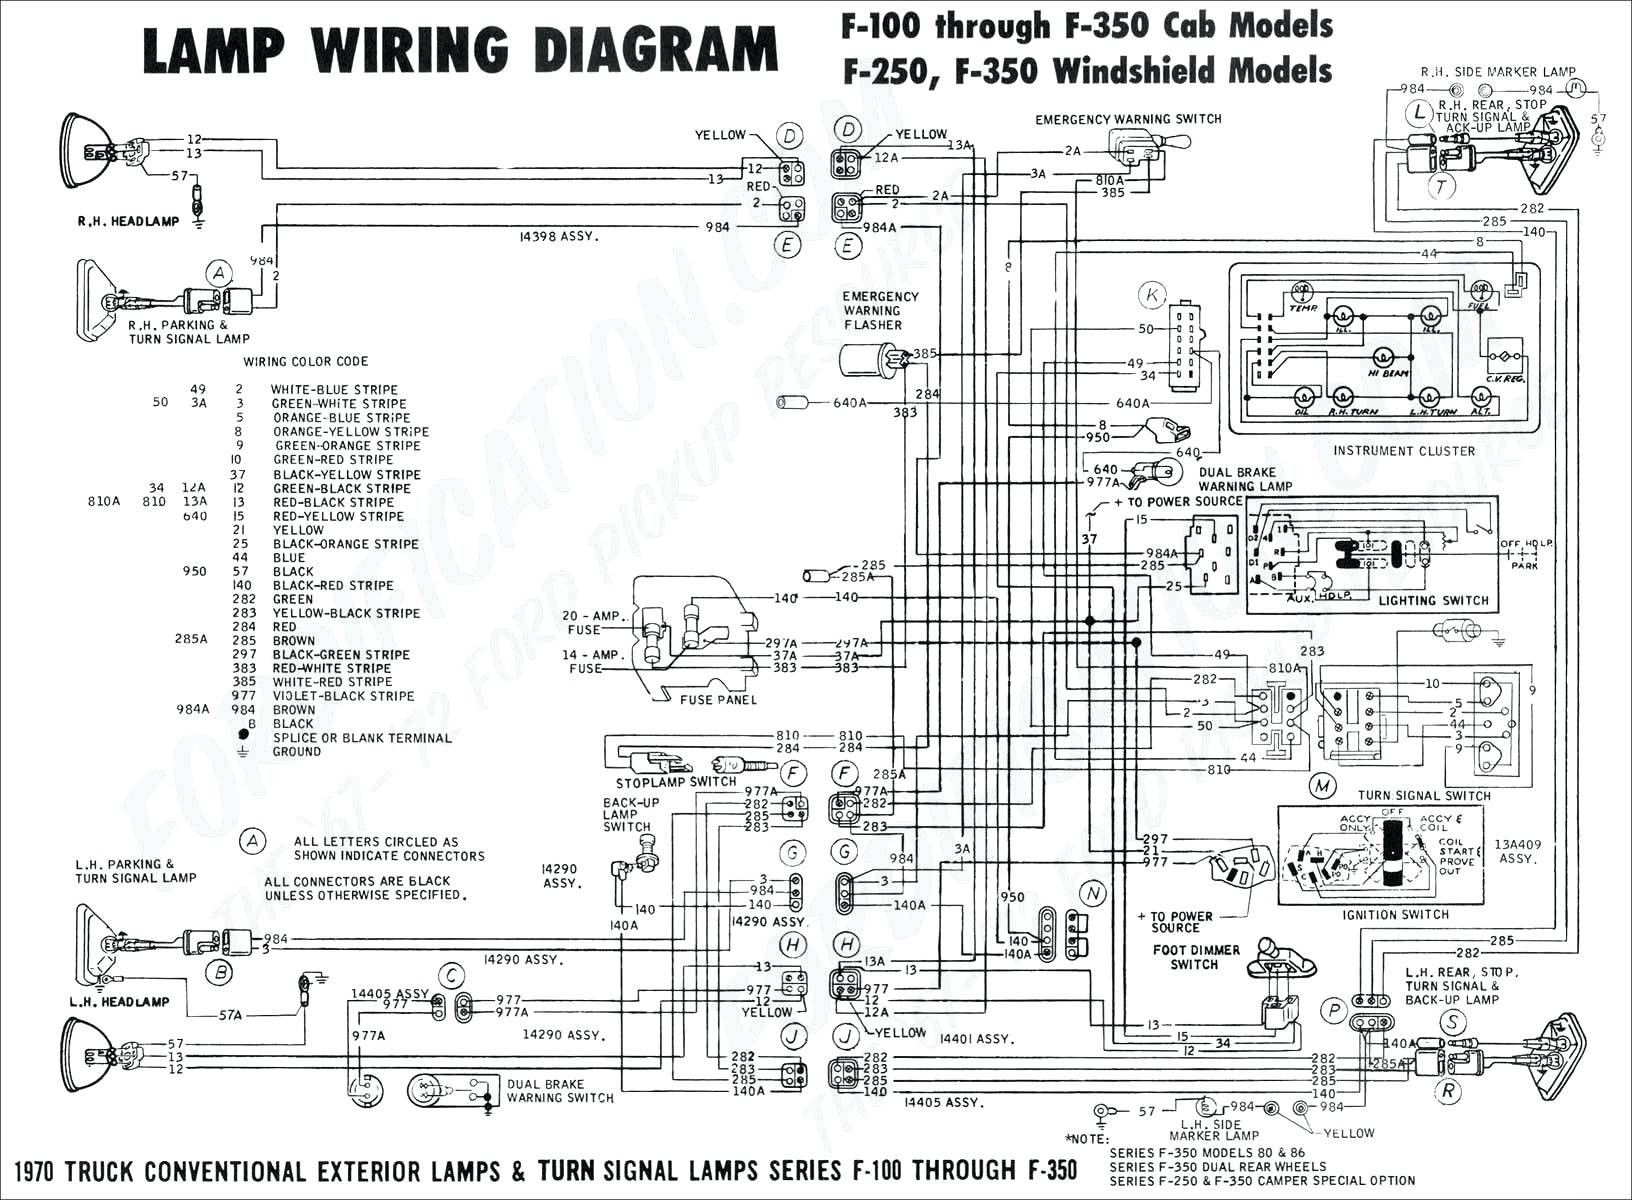 2001 Ford 7 3 Liter Diesel Engine Diagram In 2020 Electrical Wiring Diagram Trailer Wiring Diagram Diagram